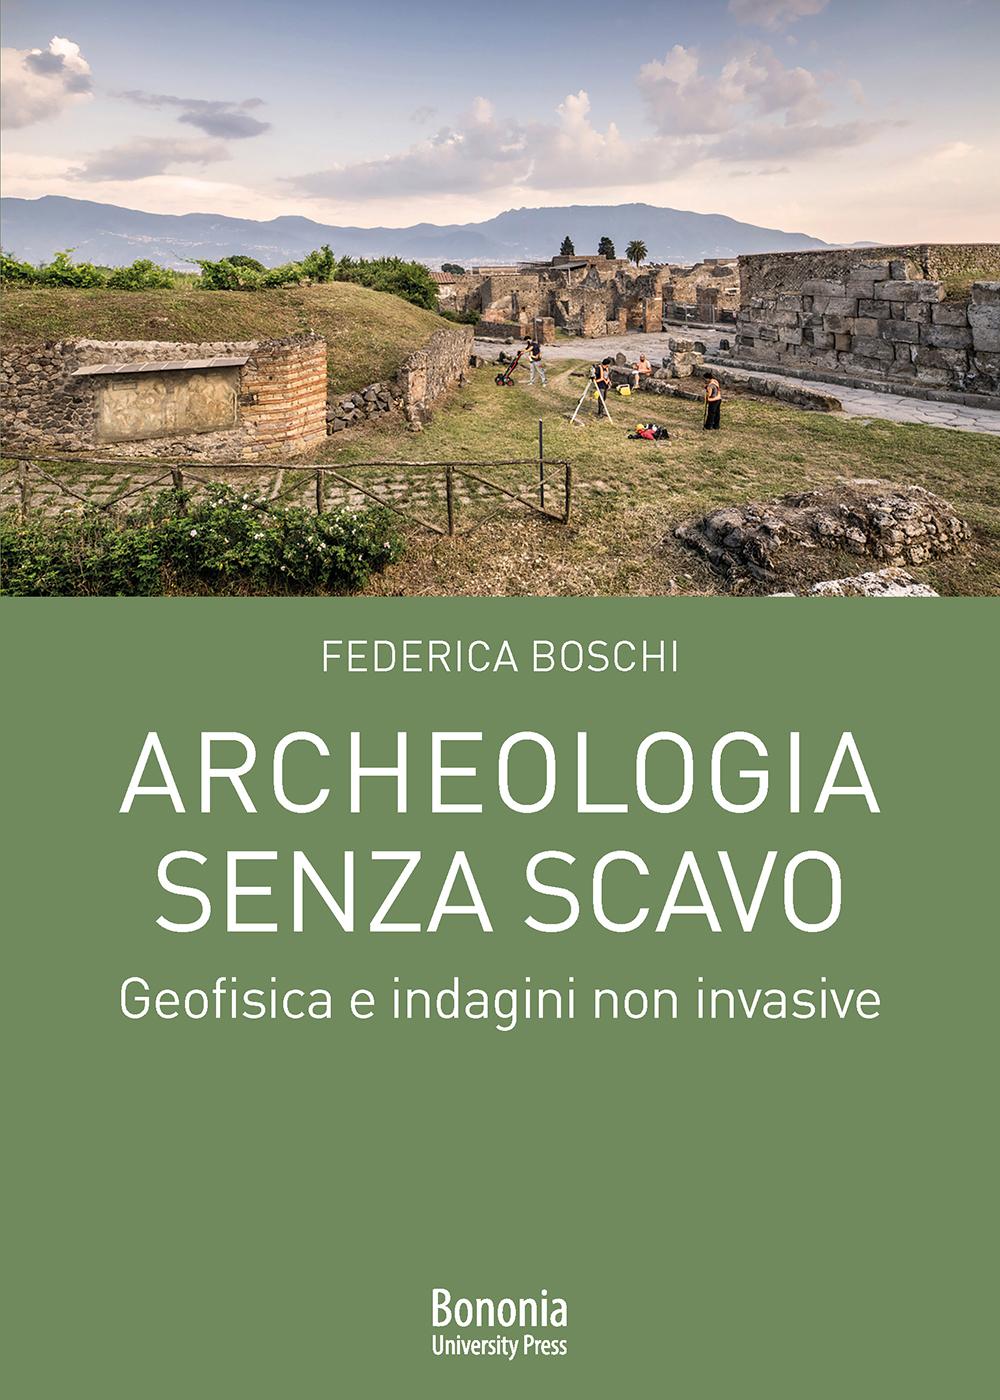 Archeologia senza scavo - Bononia University Press